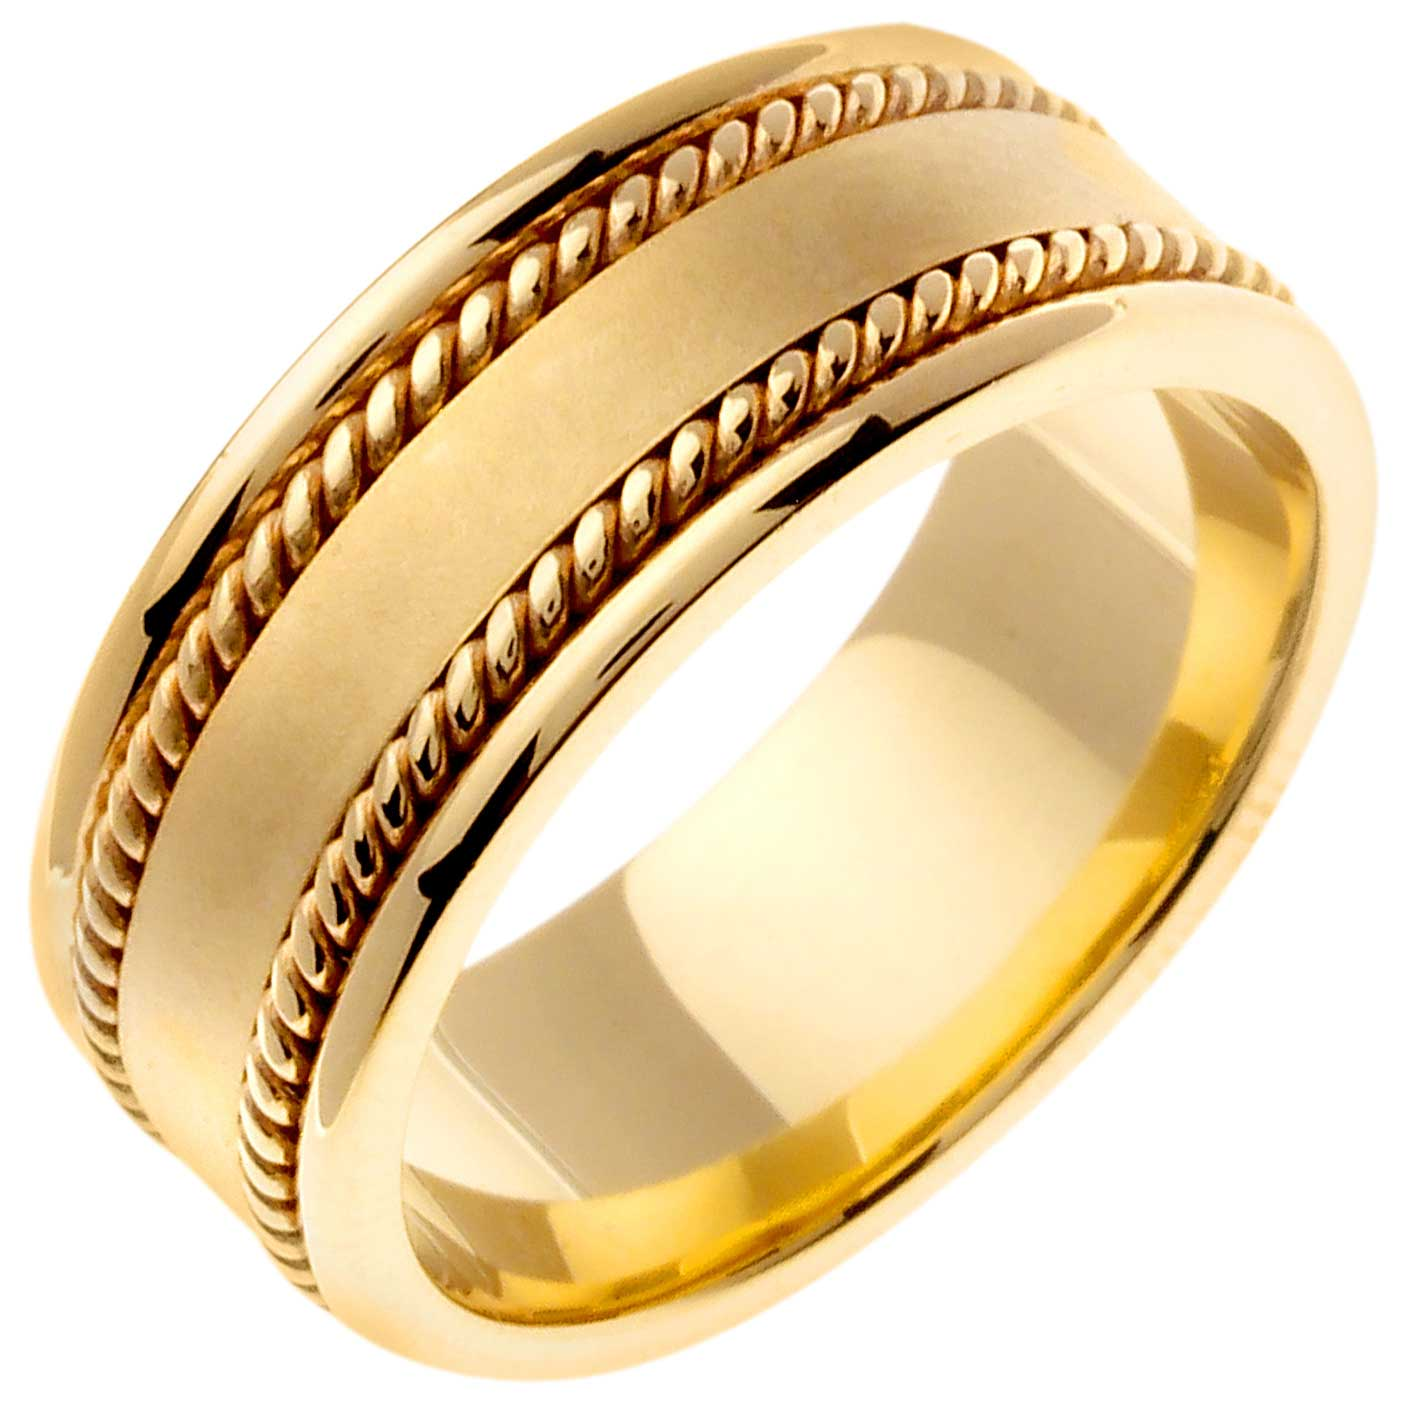 14K Gold Rope Edge Braid Handmade Comfort Fit Men's Wedding Band (8mm)